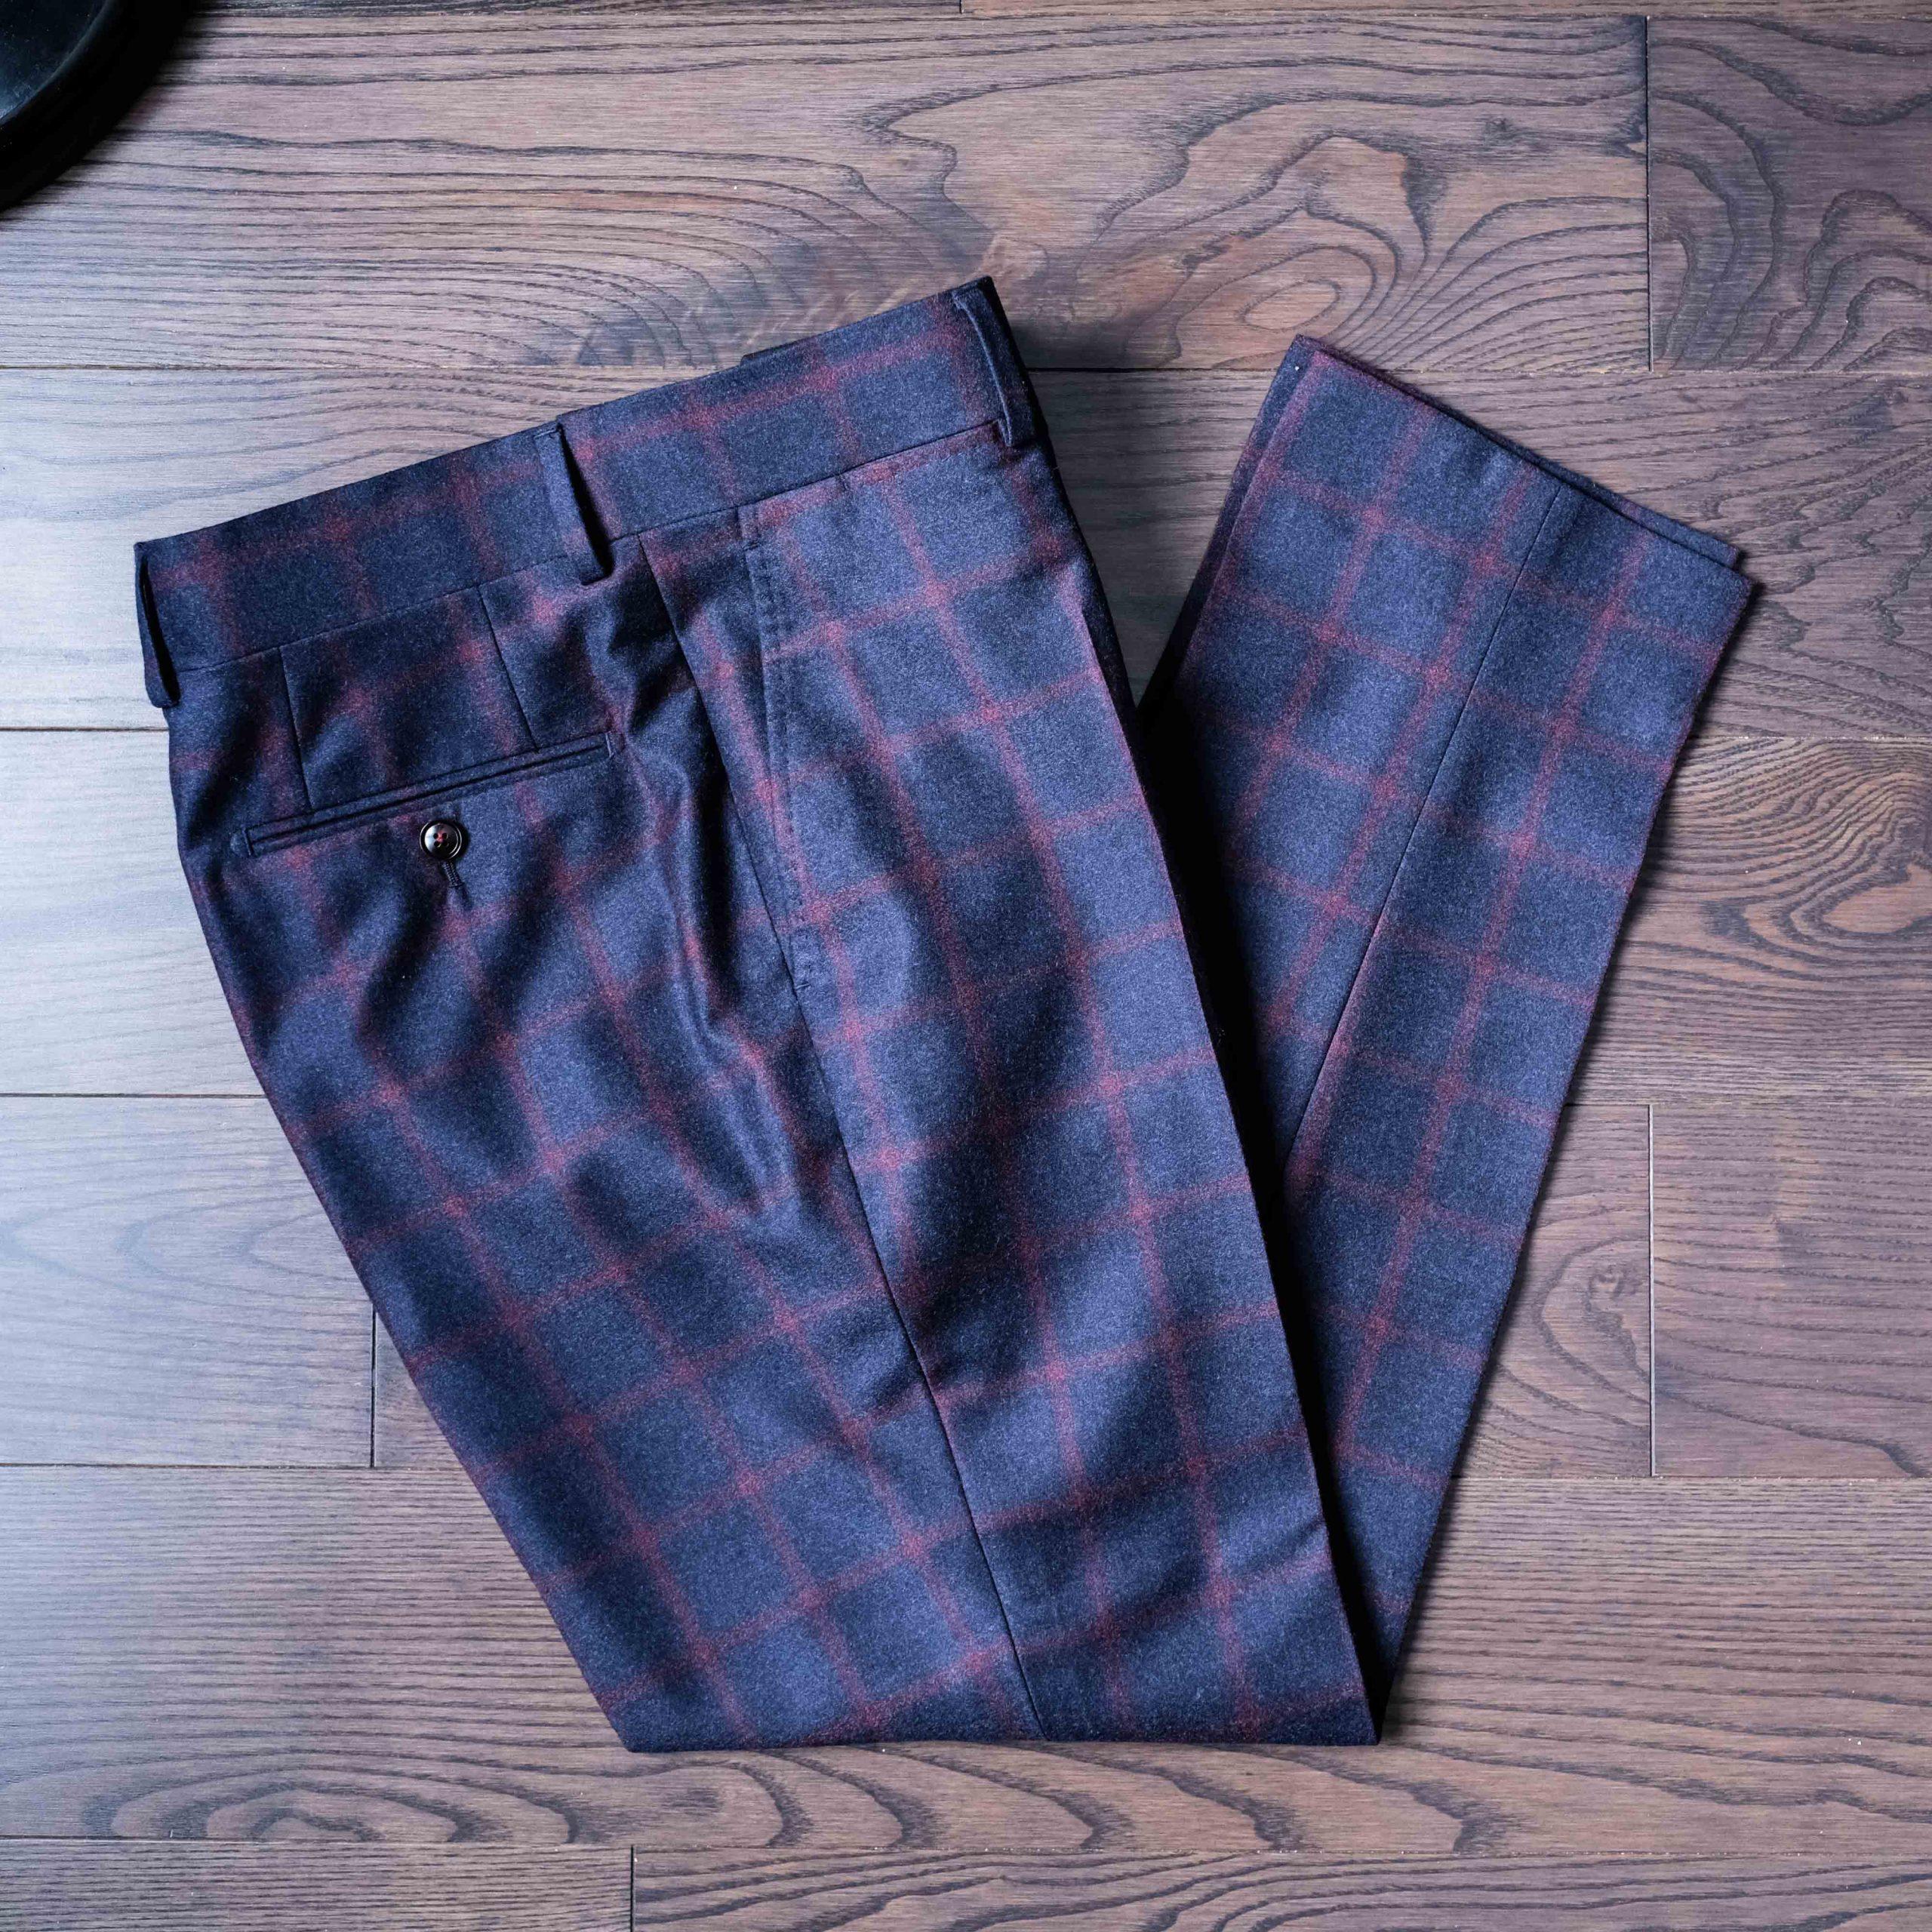 Bespoke Tailored Trousers